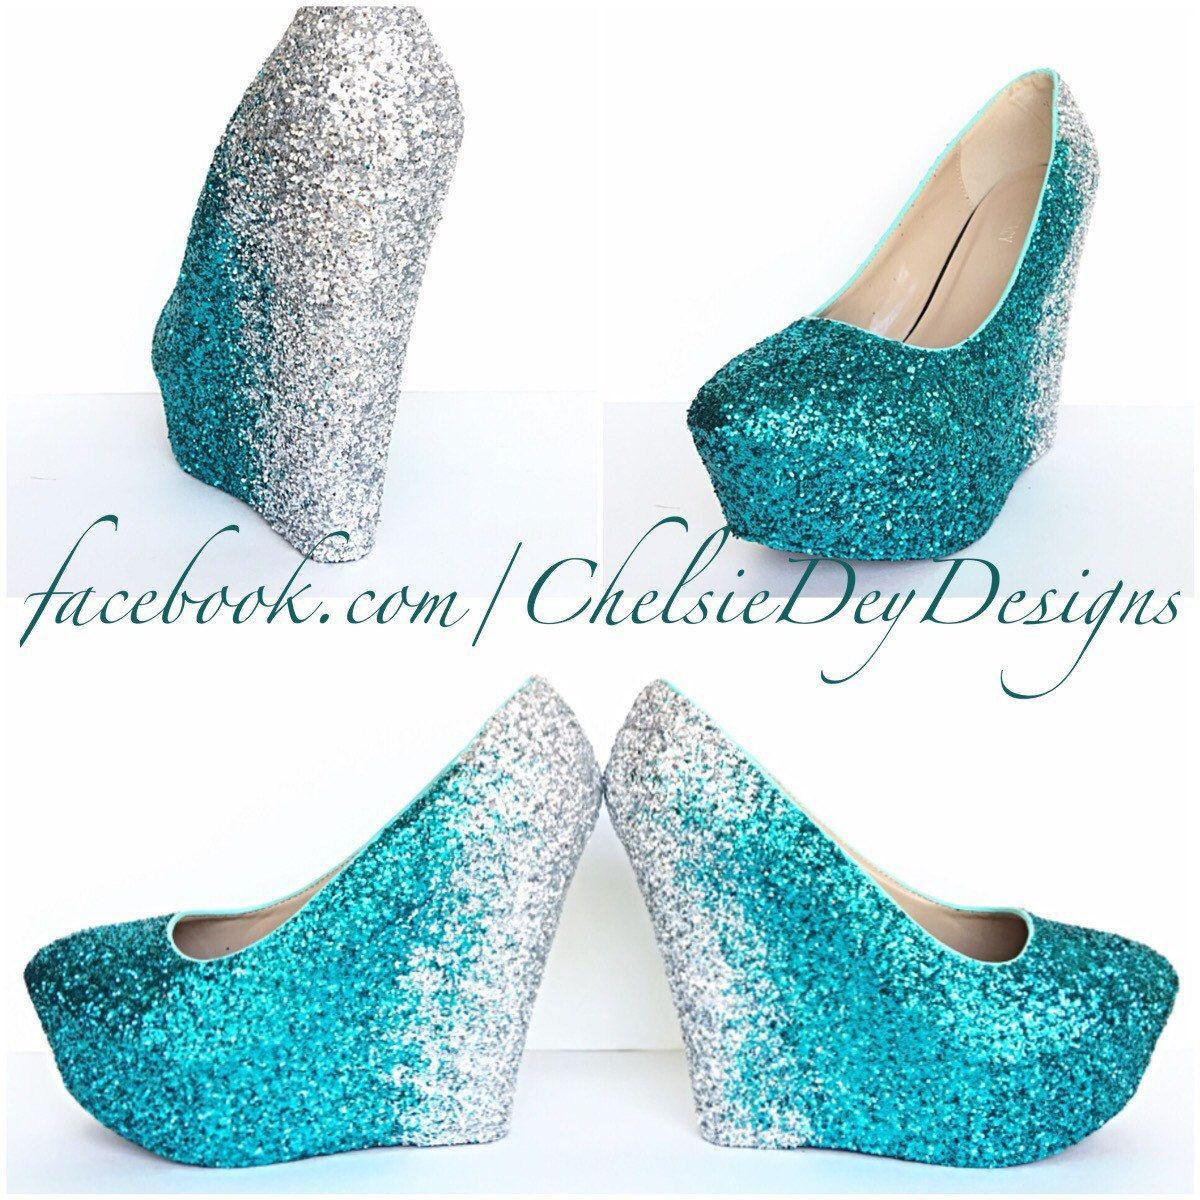 Glitter Wedges - Teal Silver Sparkly Ombre Platform Heel - Glitzy ...